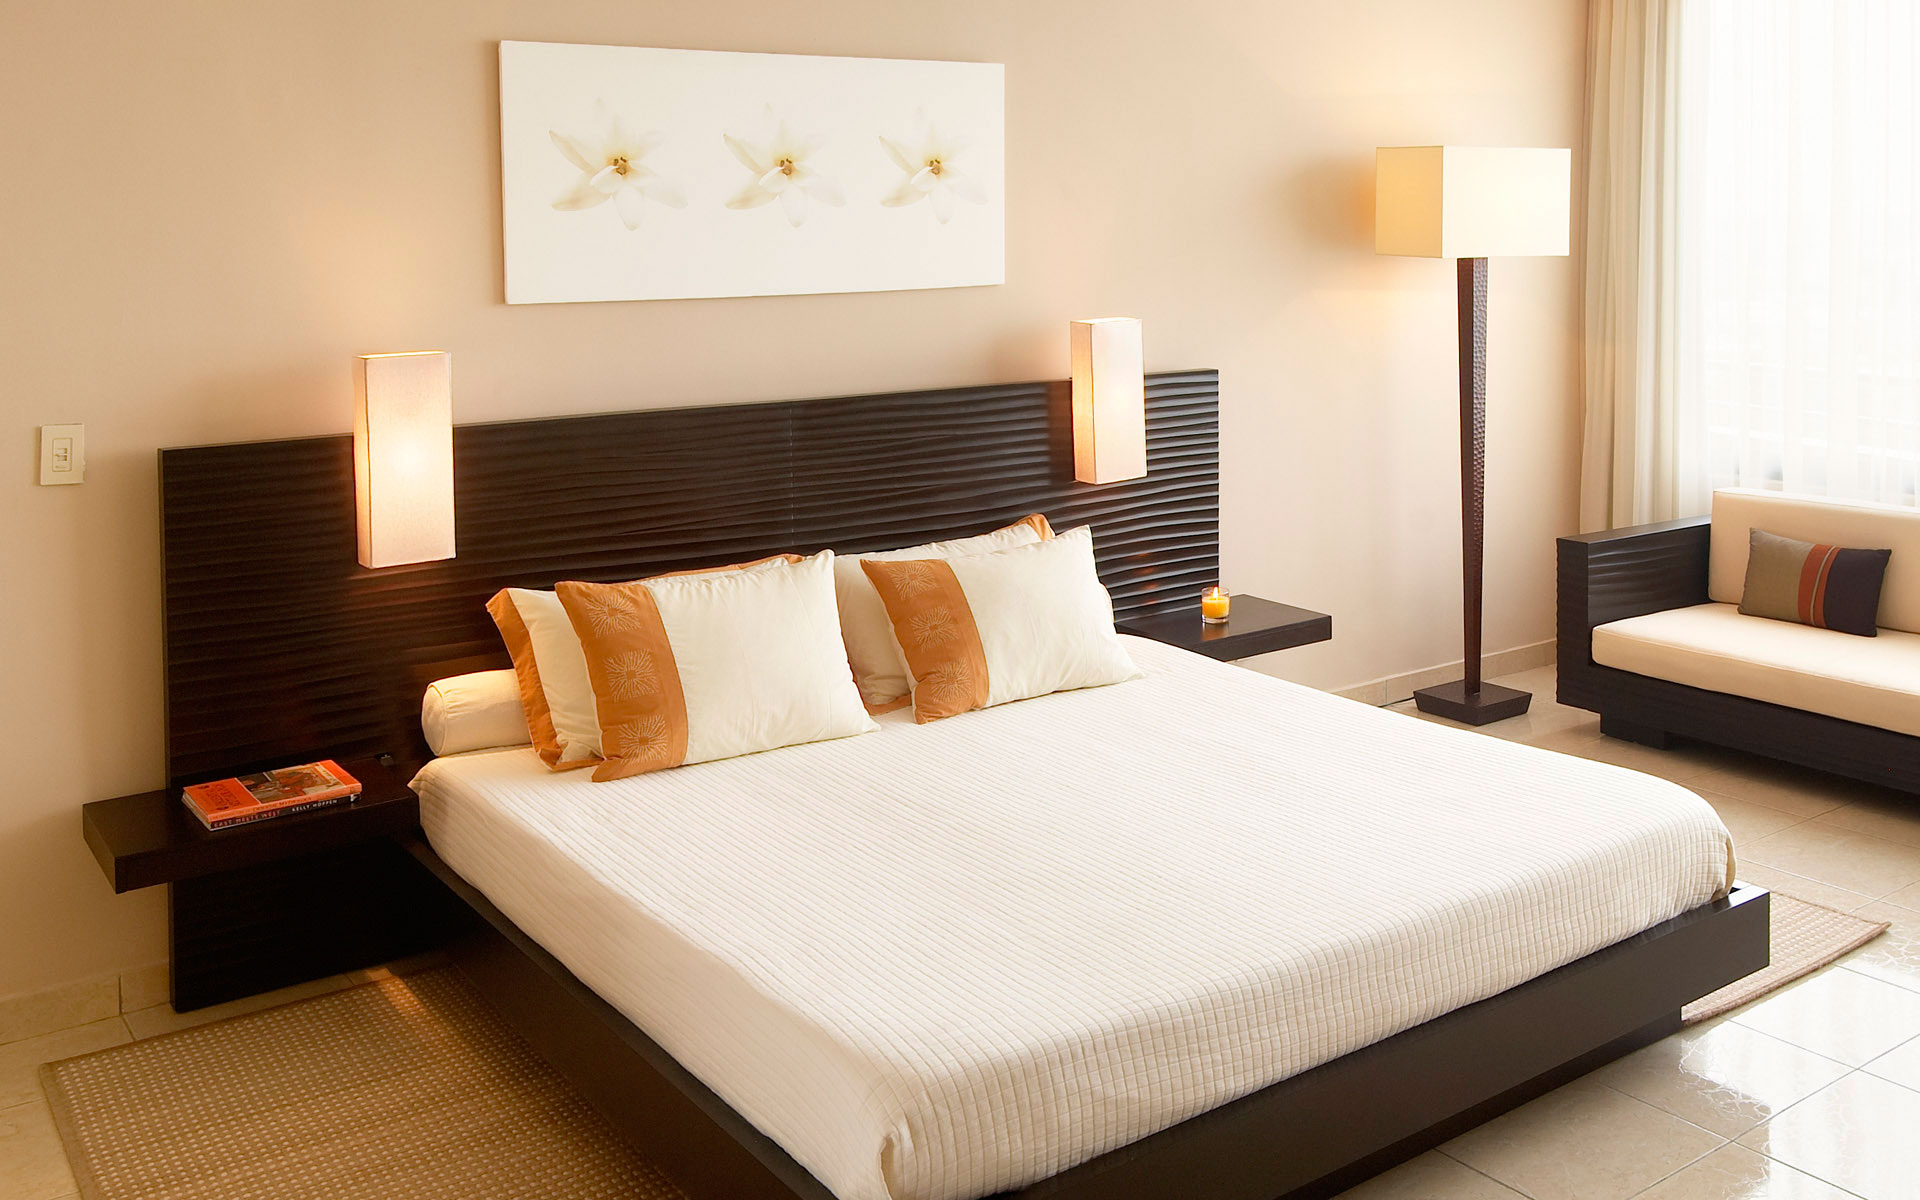 Особенности конострукции кровати